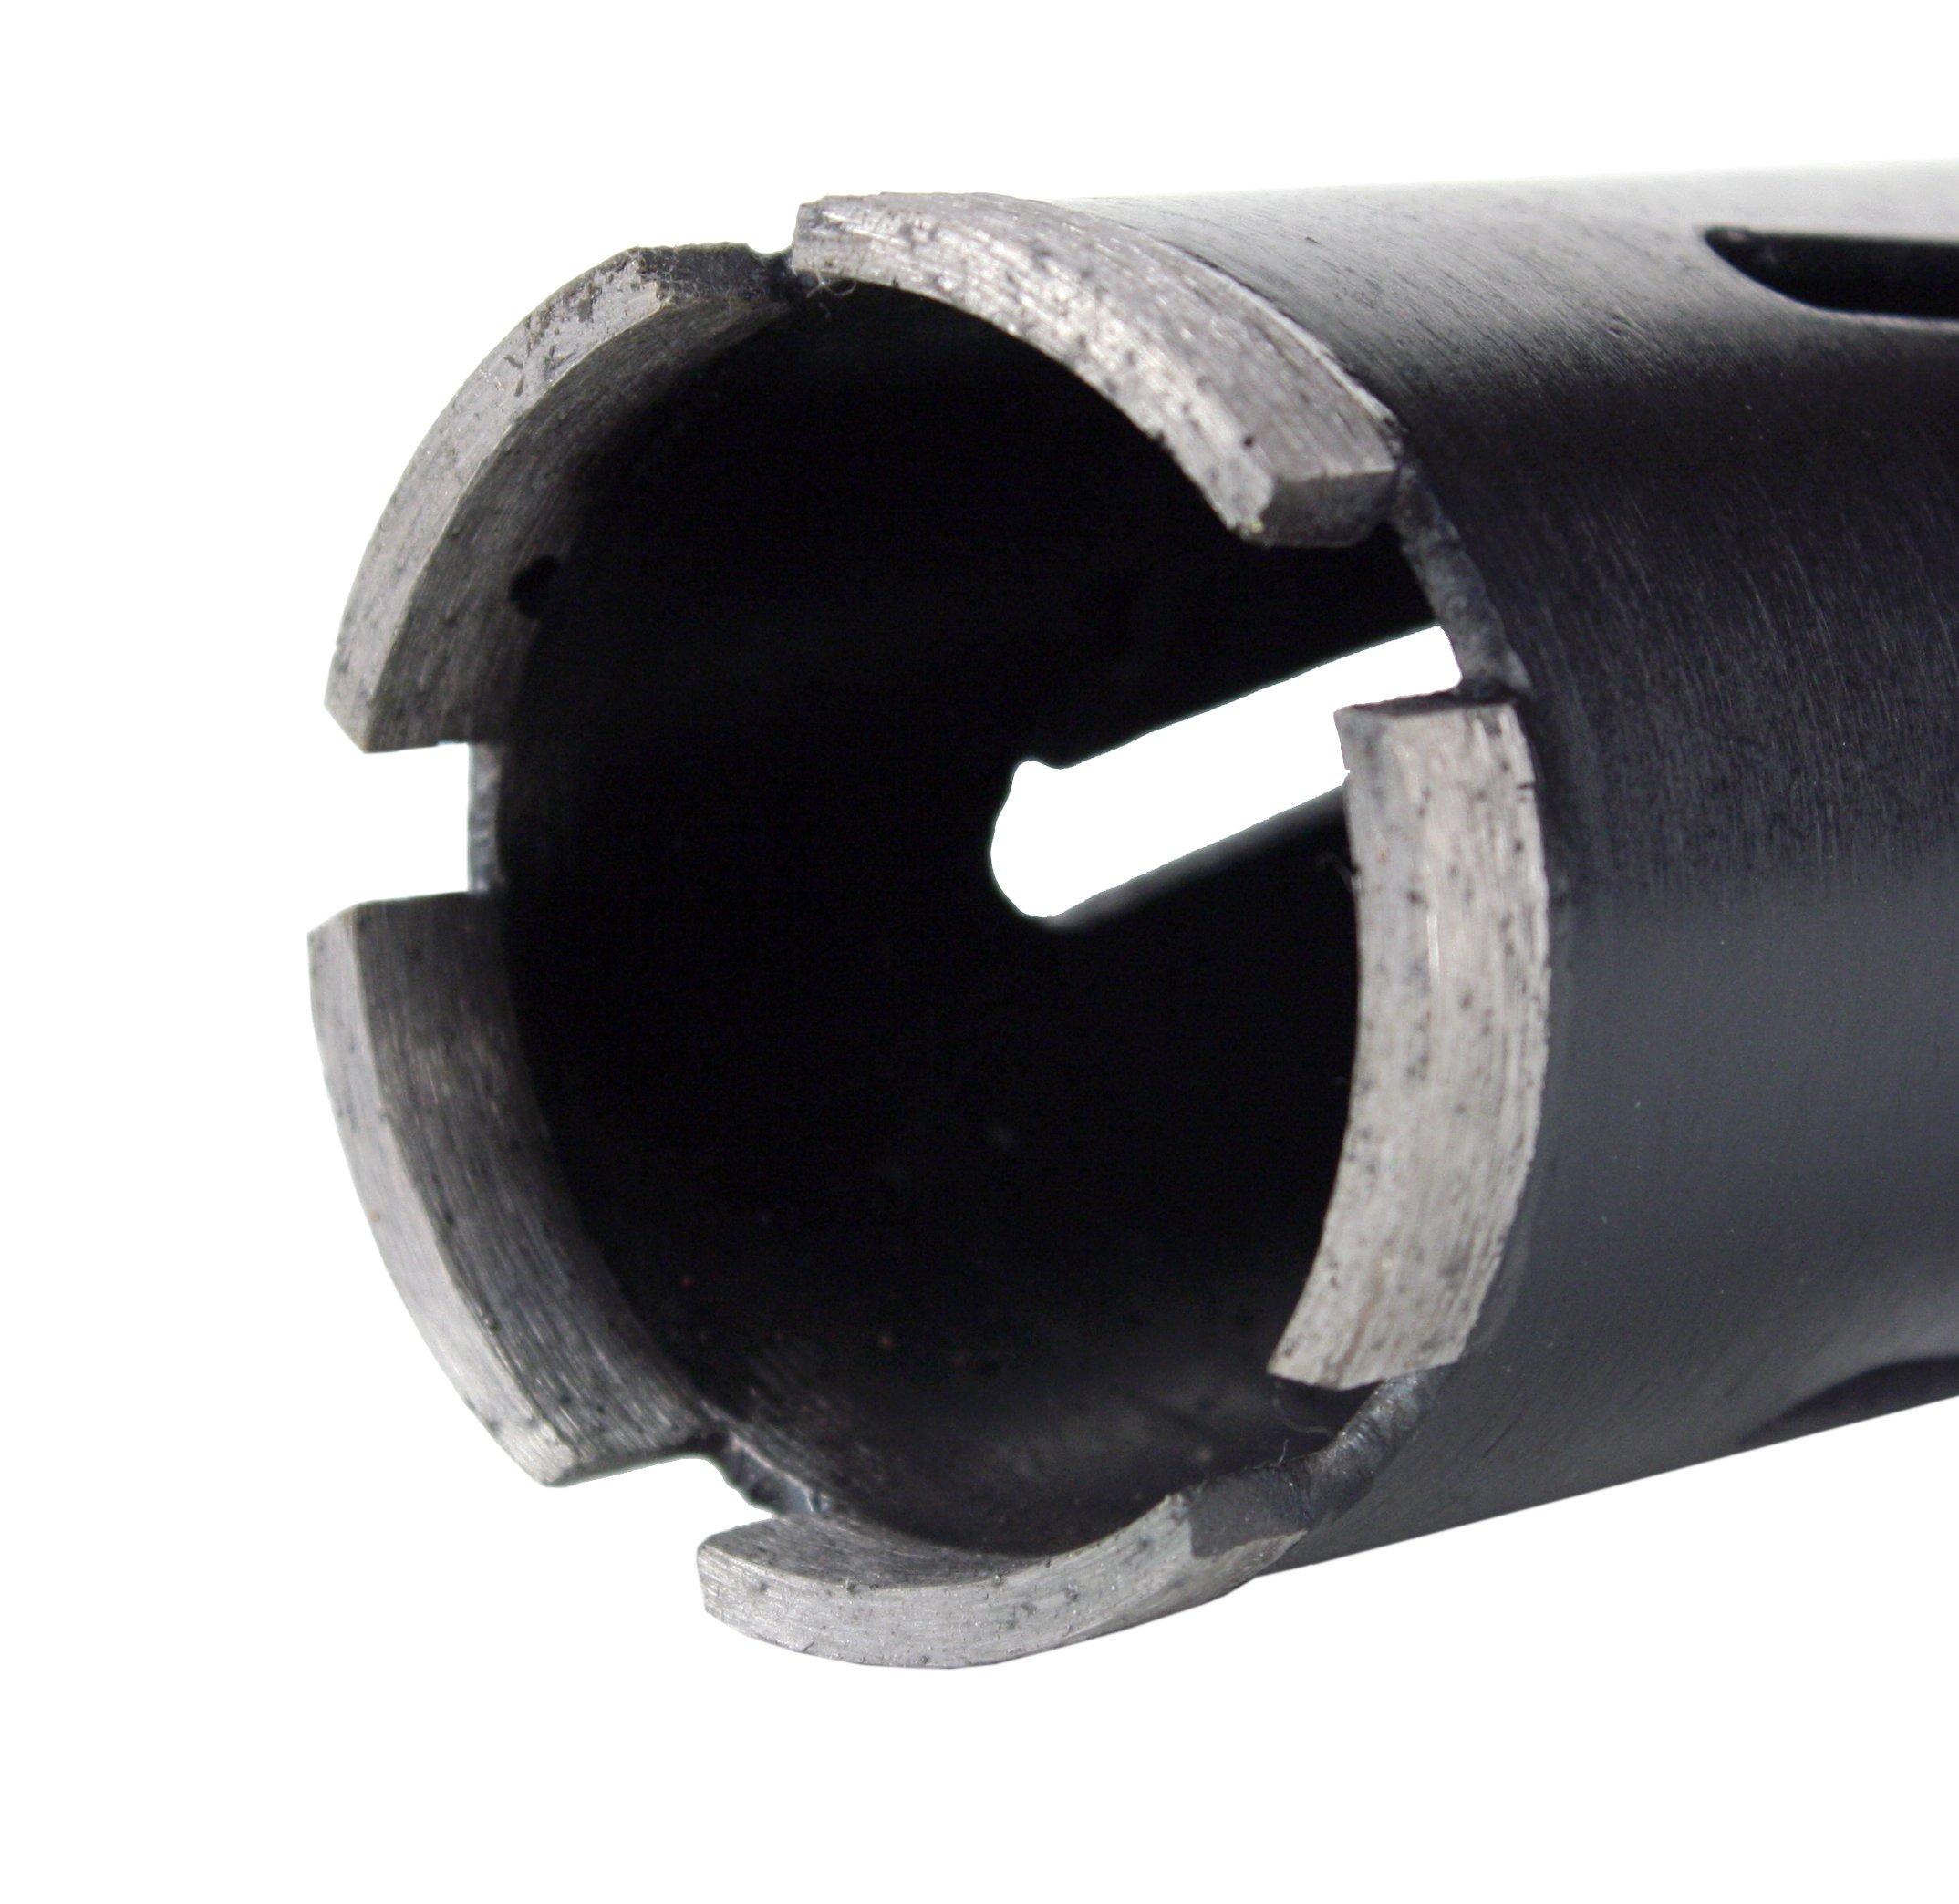 "Steel Dragon Tools 2-1/2"" (63 mm) x 6"" Dry Diamond Masonry Core Drill Bit"